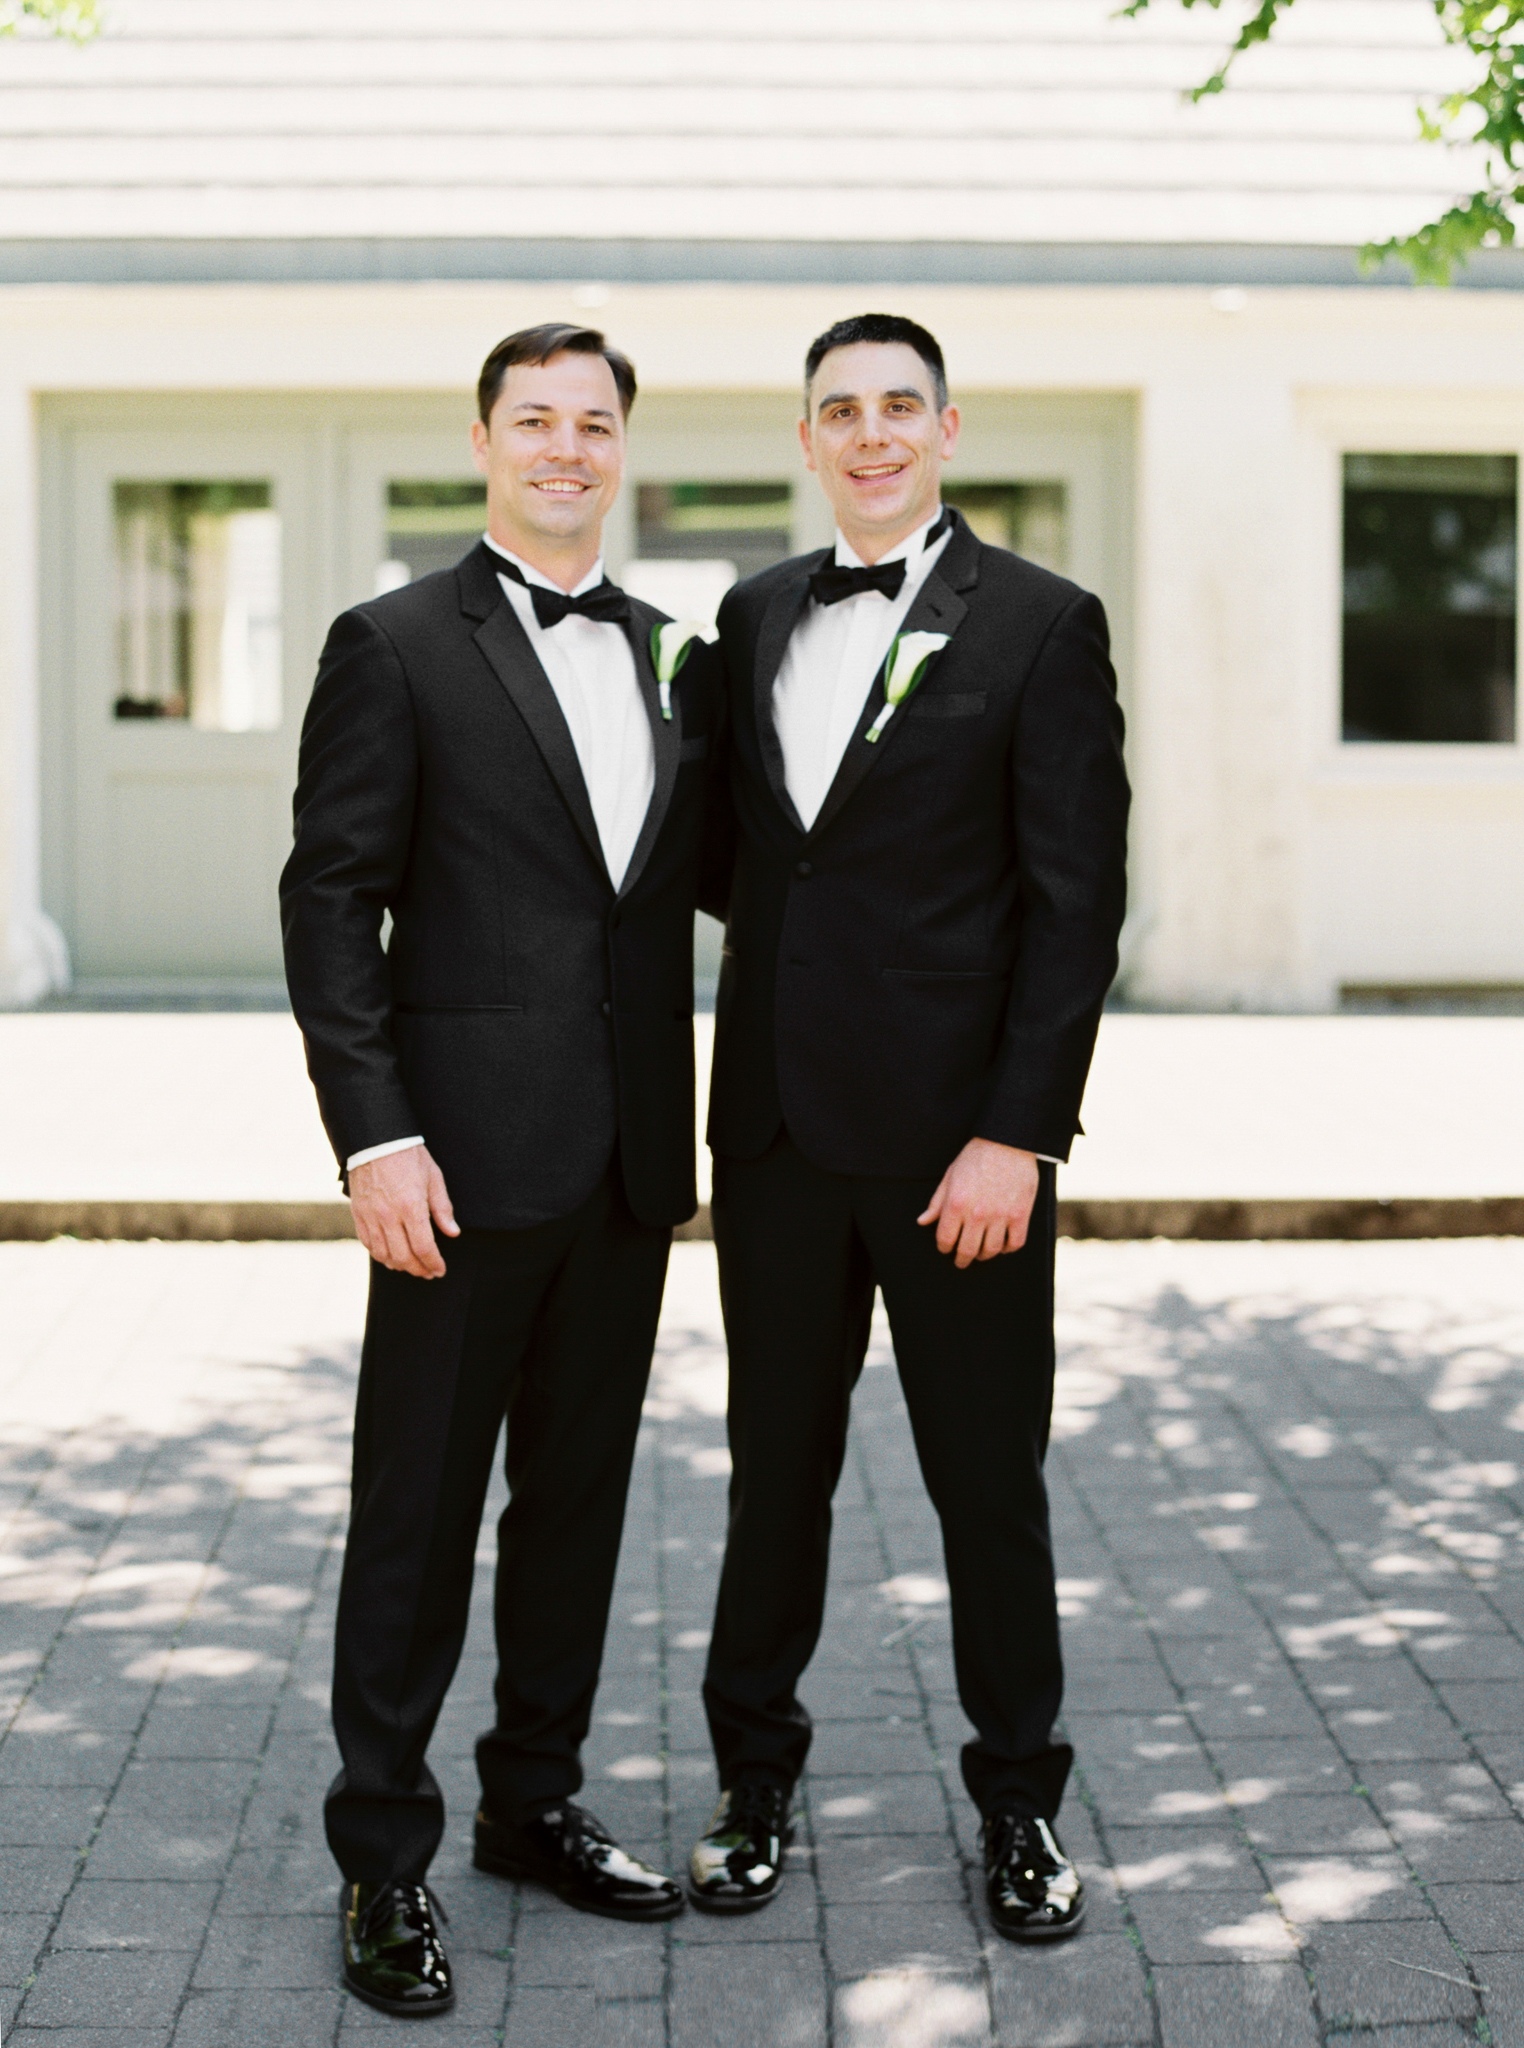 065OutliveCreative_Travel_Photographer_Videographer_Lewis&Clark_Oregon_Elegant_BlackTie_Destination_Wedding.jpg